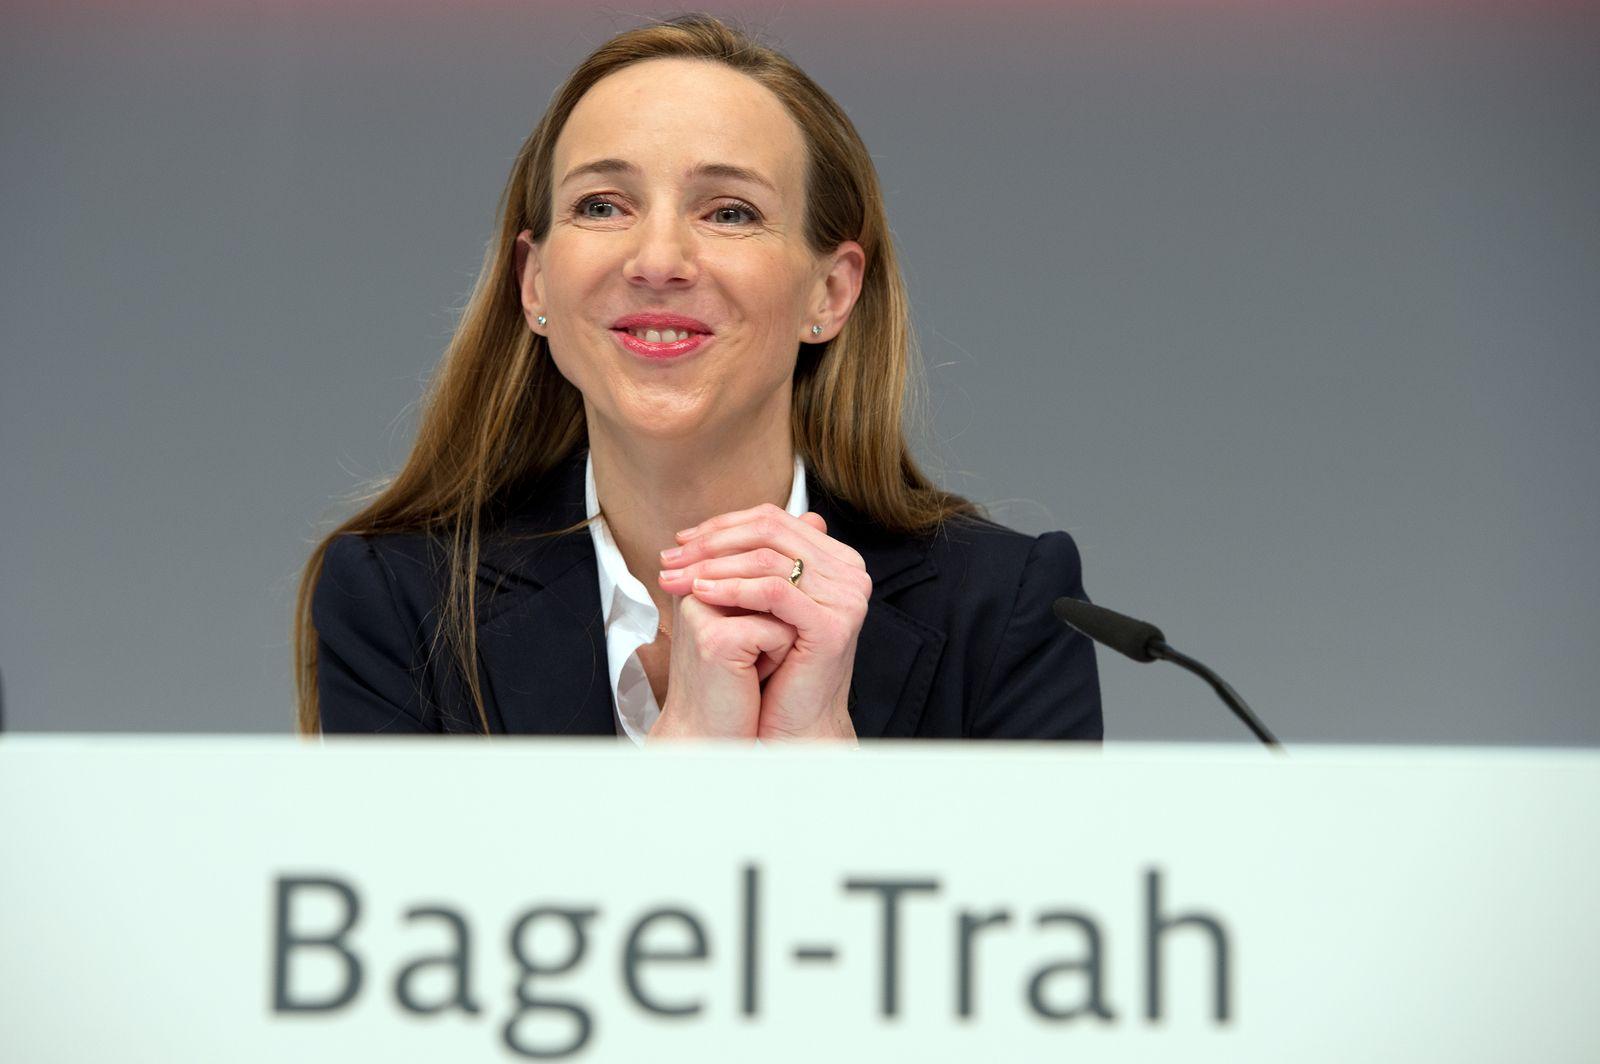 Aufsichtsrätinnen / Simone Bagel-Trah